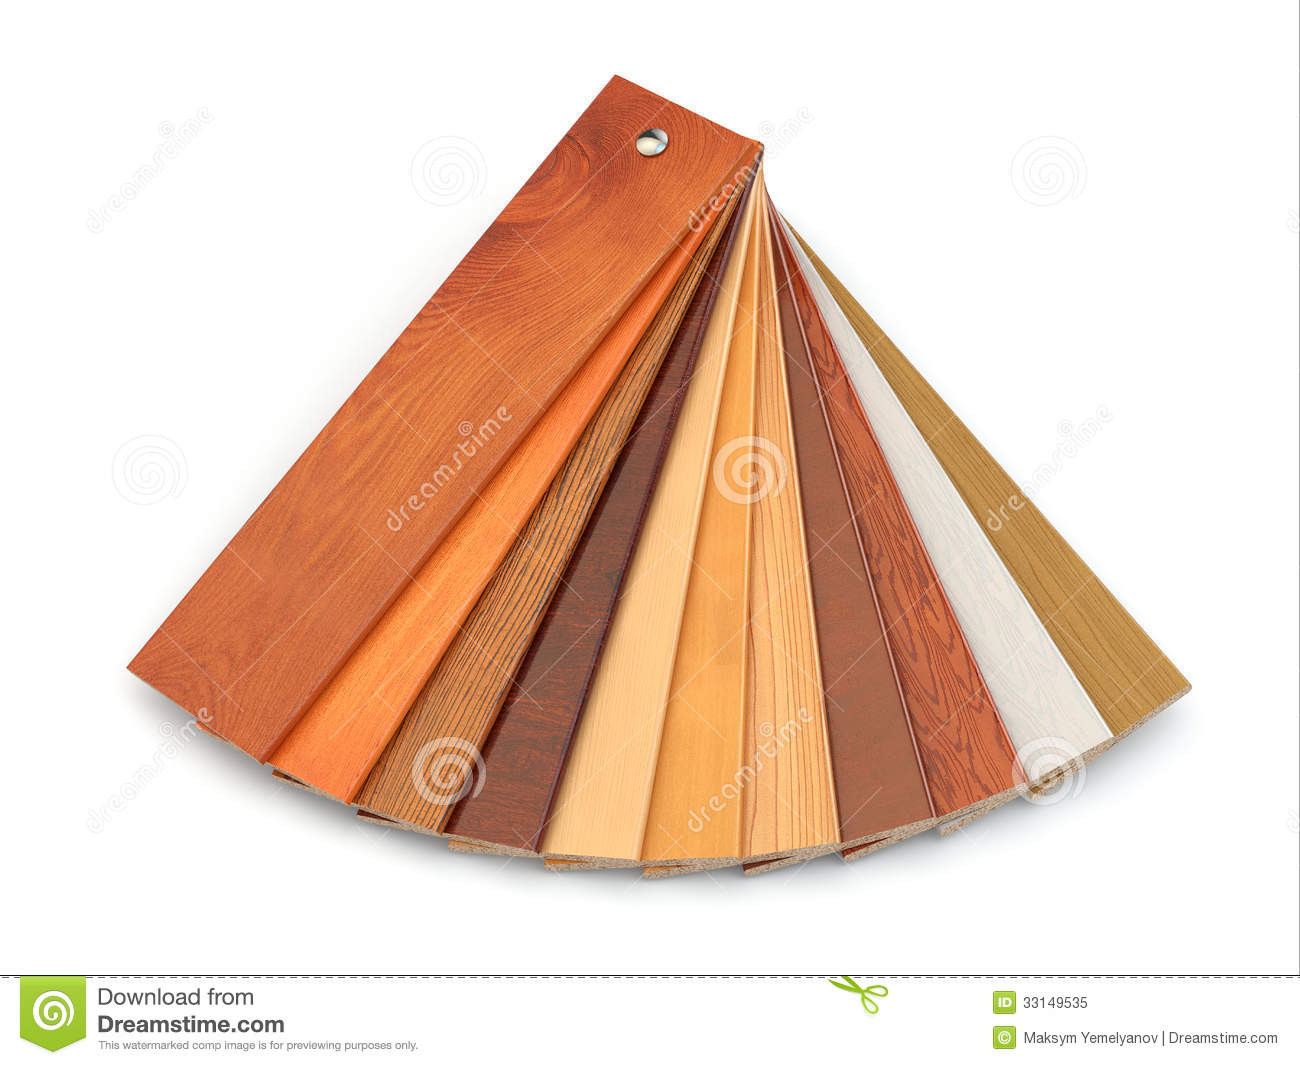 hardwood floor color samples of flooring laminate or parqet samples stock illustration in download flooring laminate or parqet samples stock illustration illustration of hardwood domestic